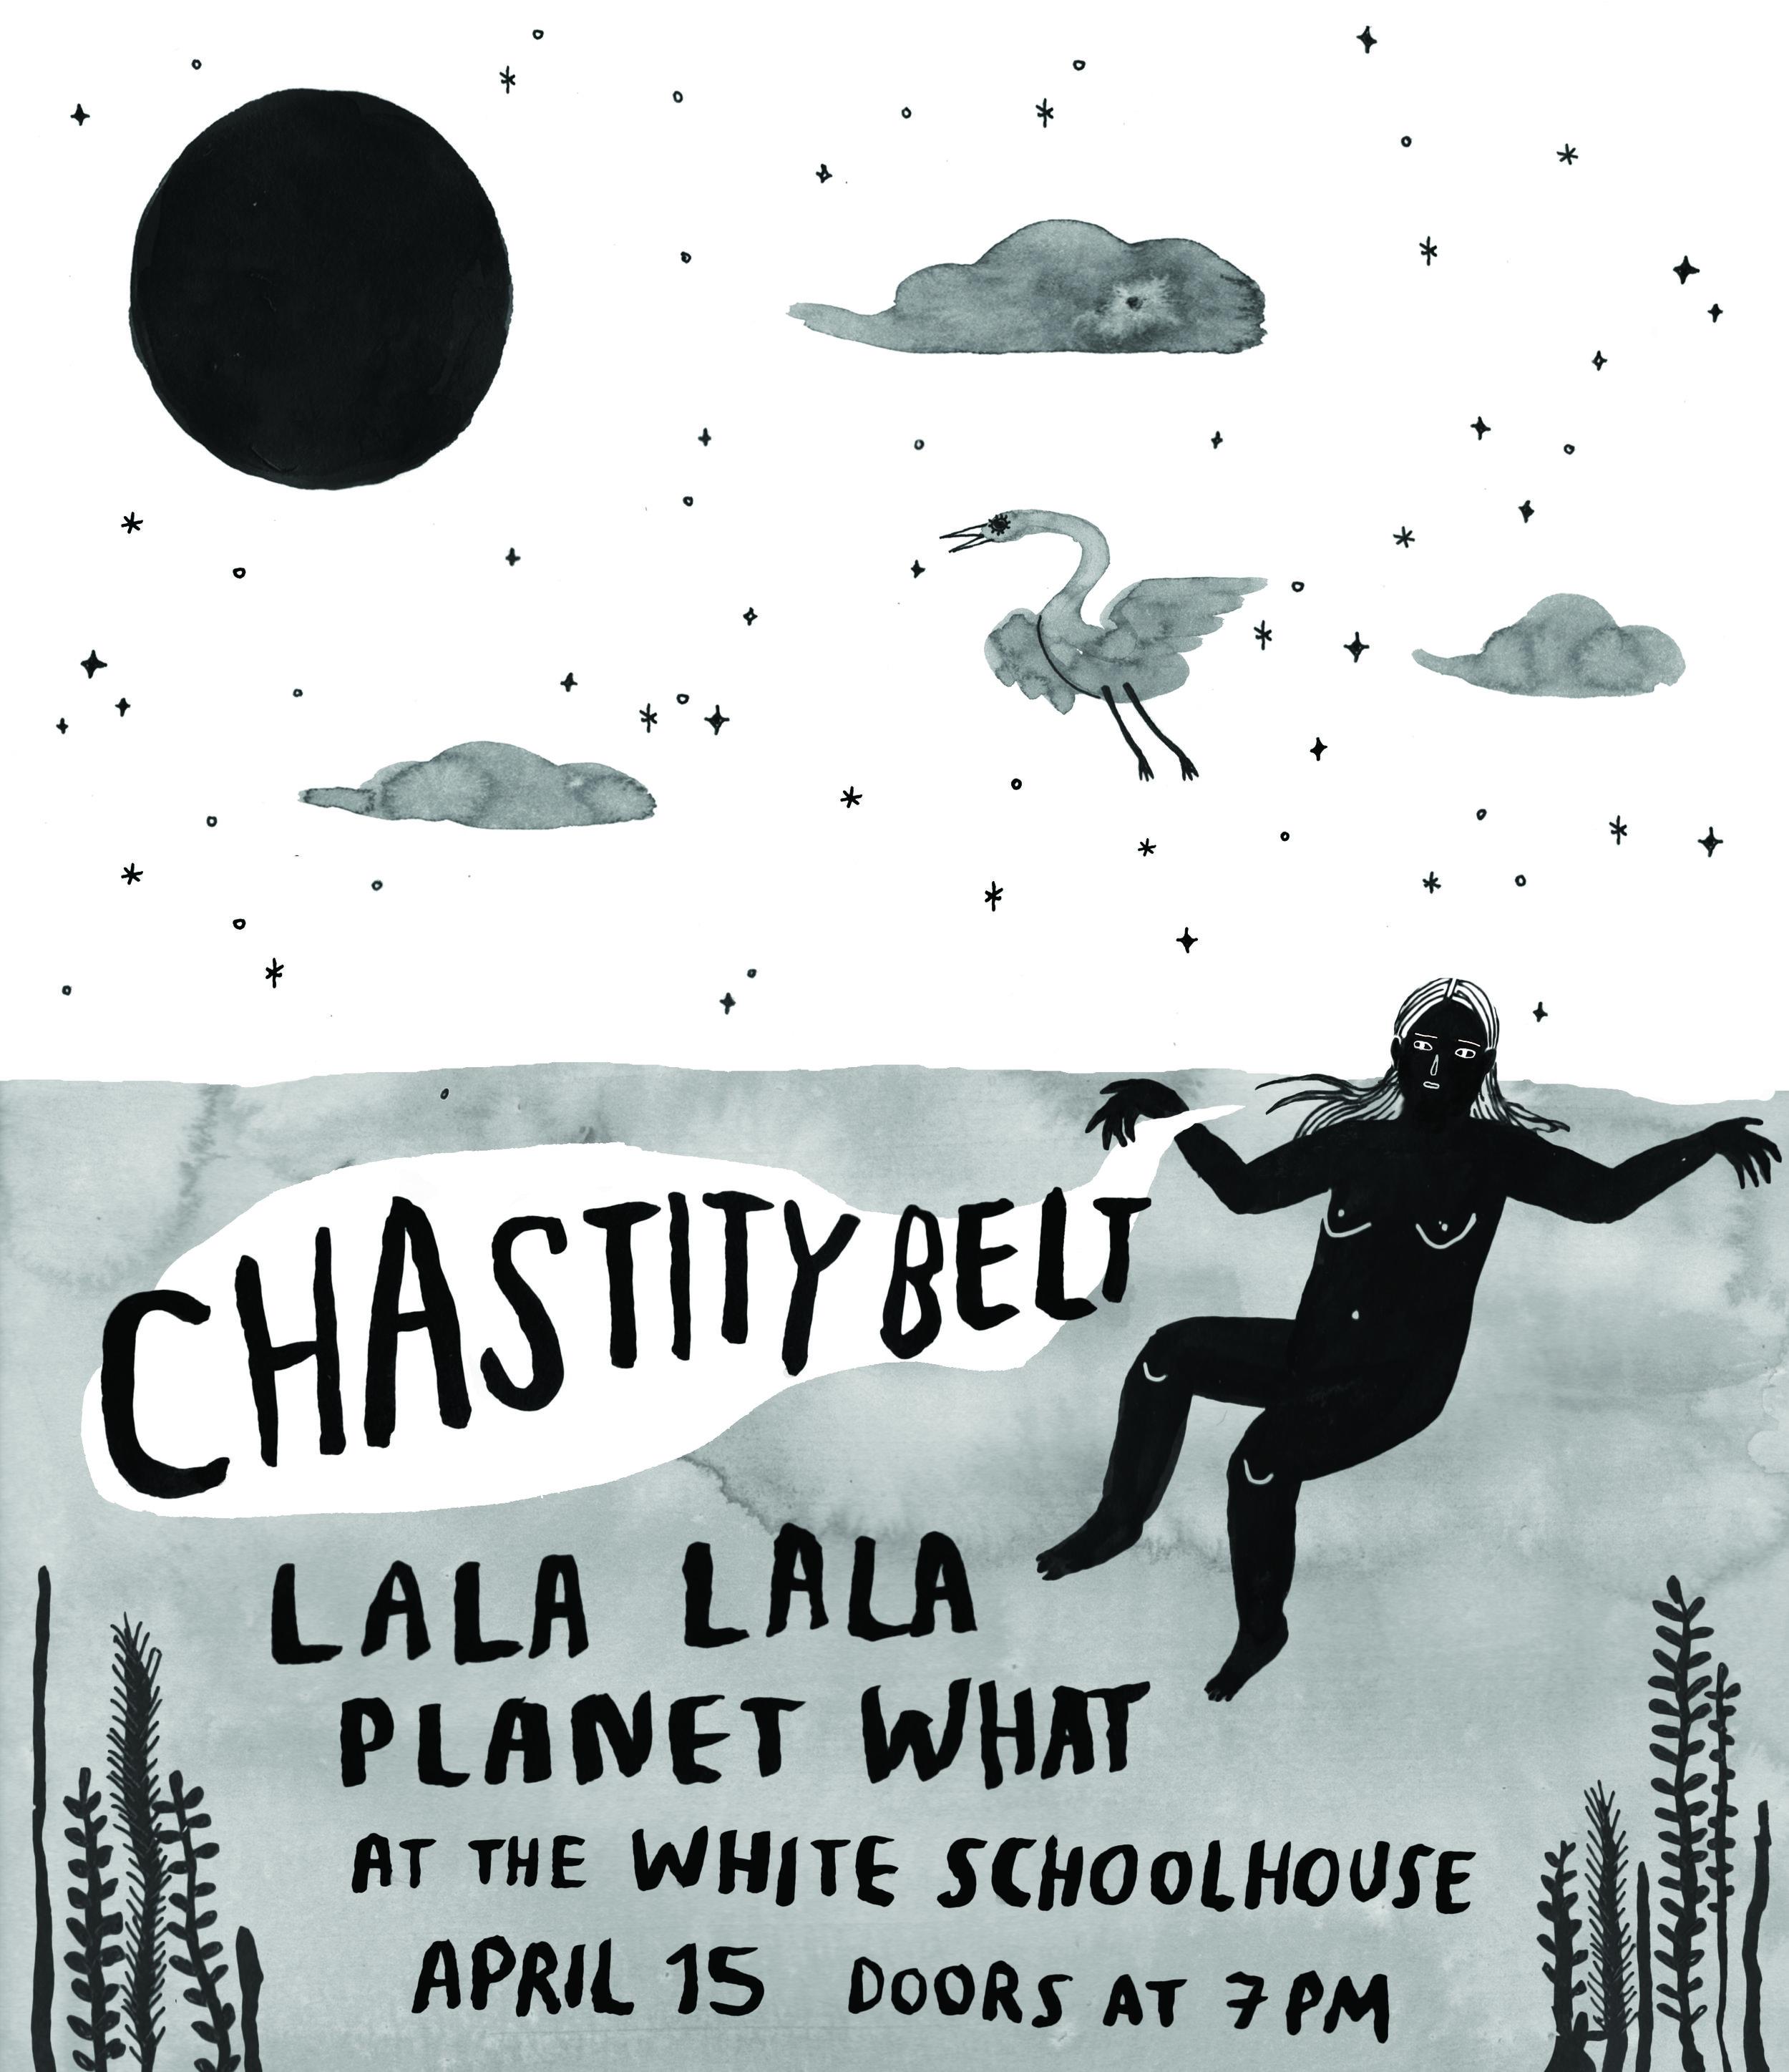 Chastity Belt • 4.15.18 • Lawrence, KS